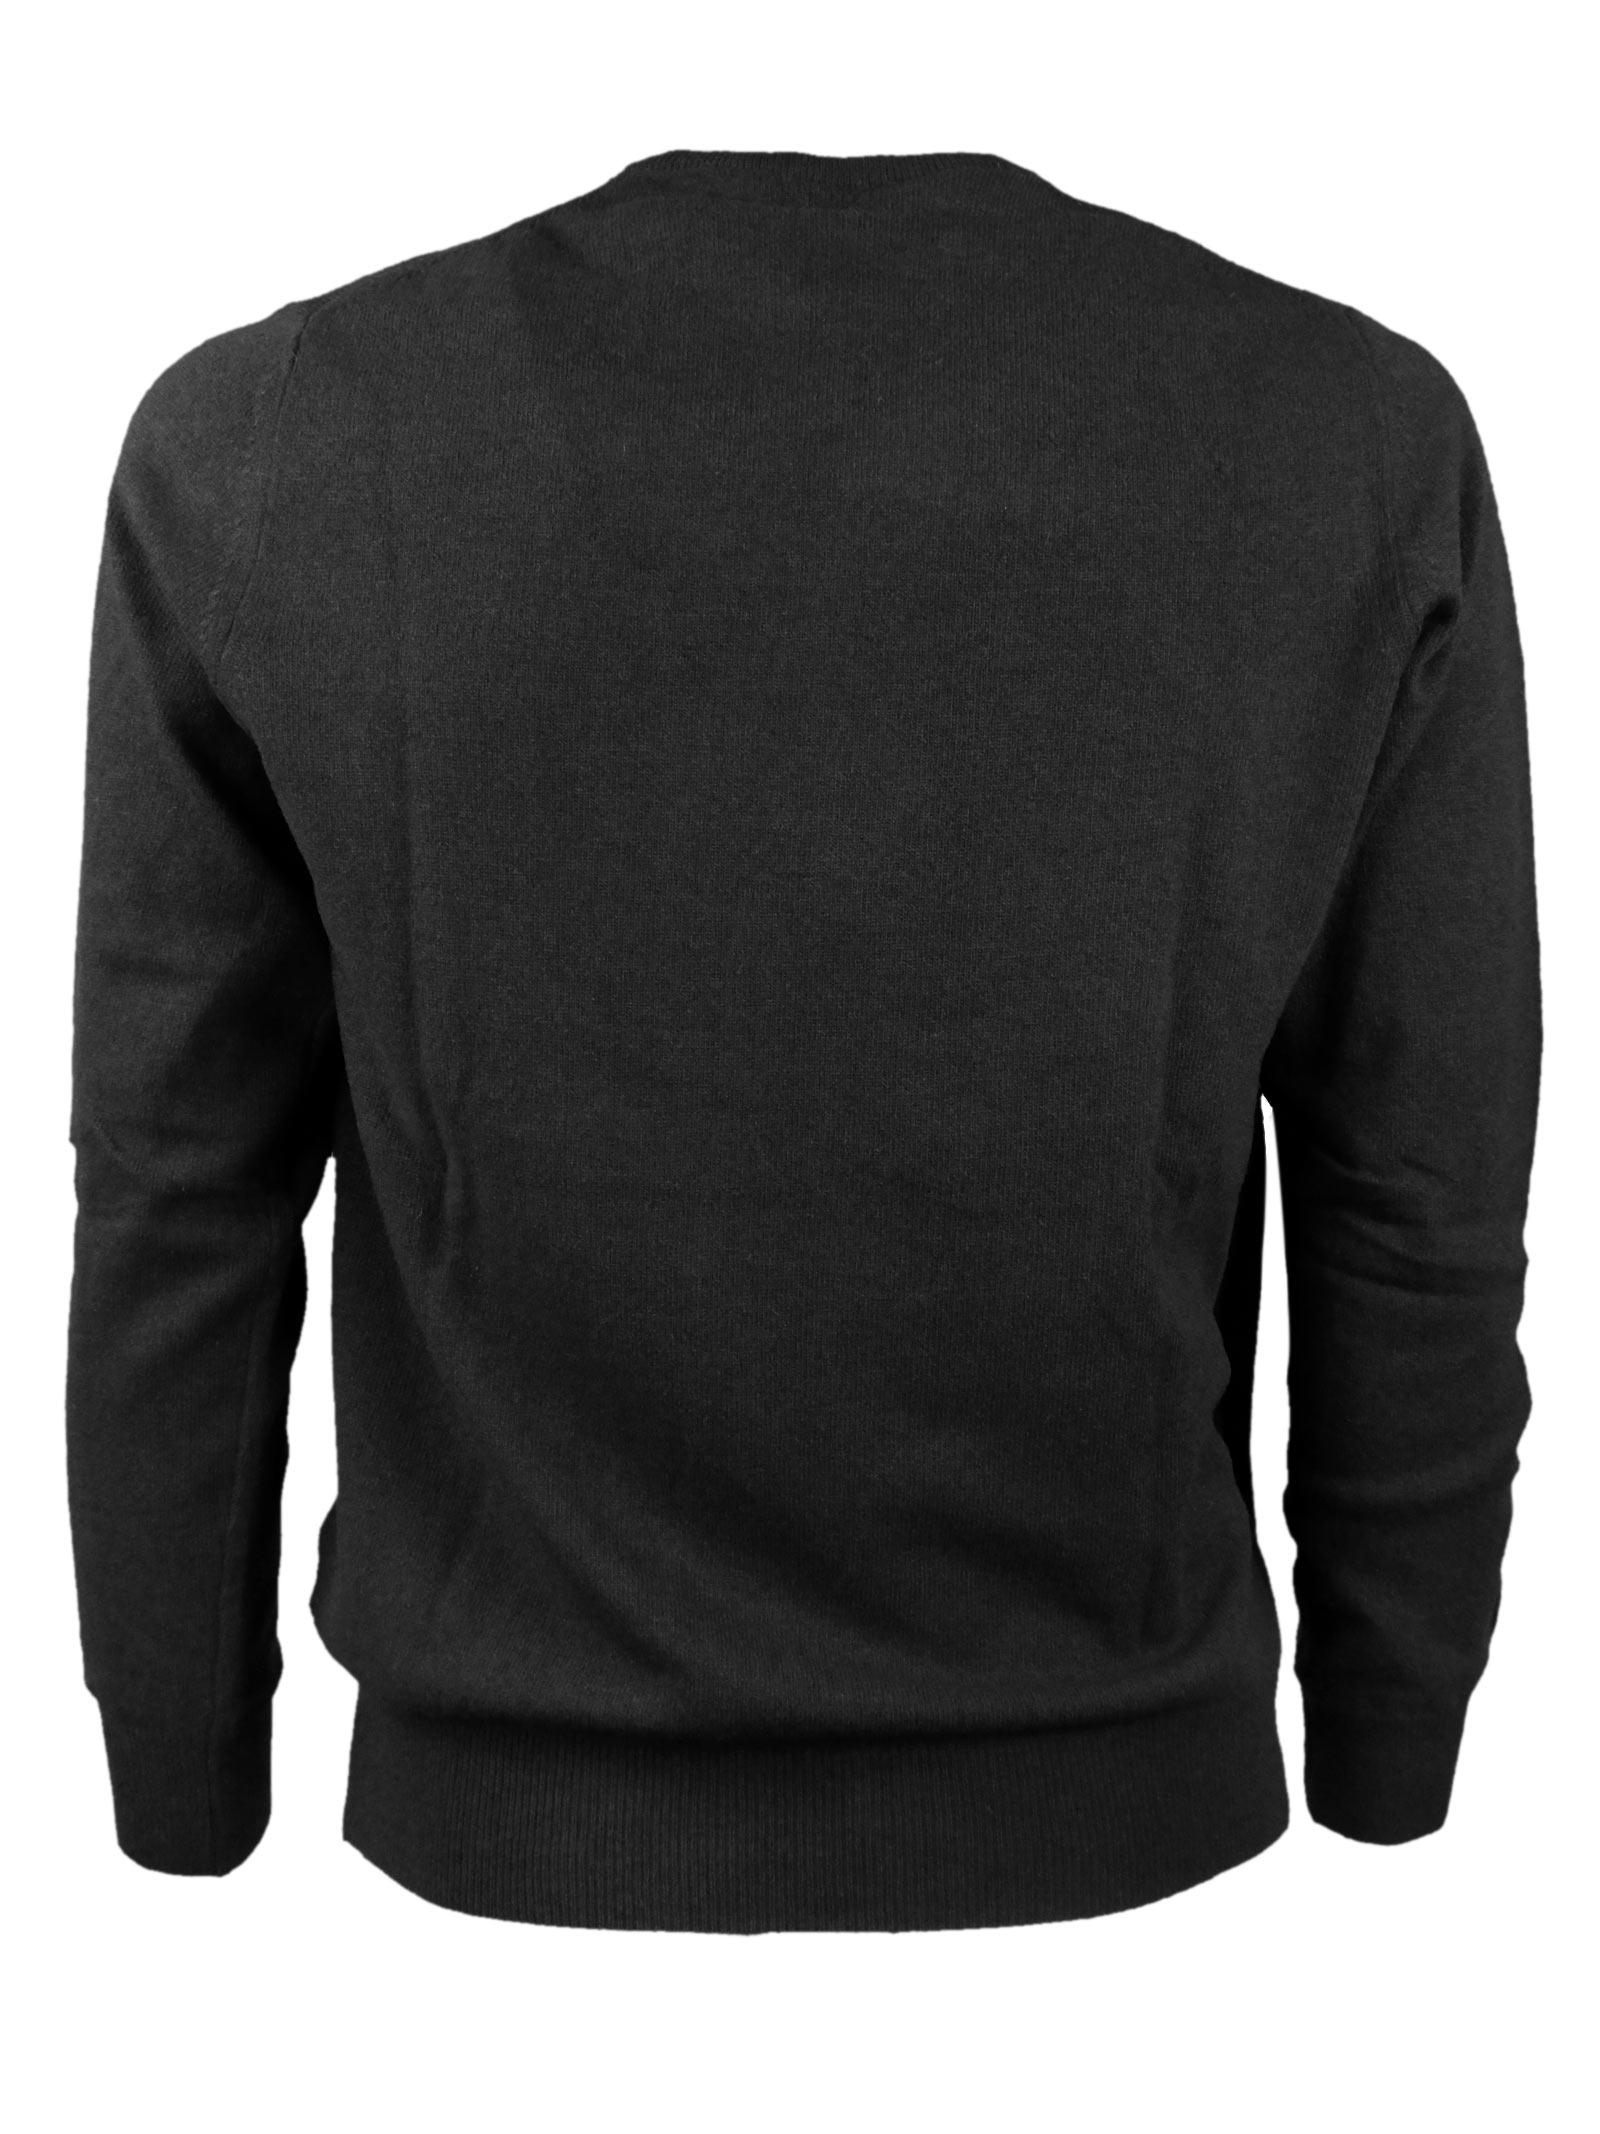 ROUNDNECK PULLOVER RICCIARDI | Knitwear | 455615009